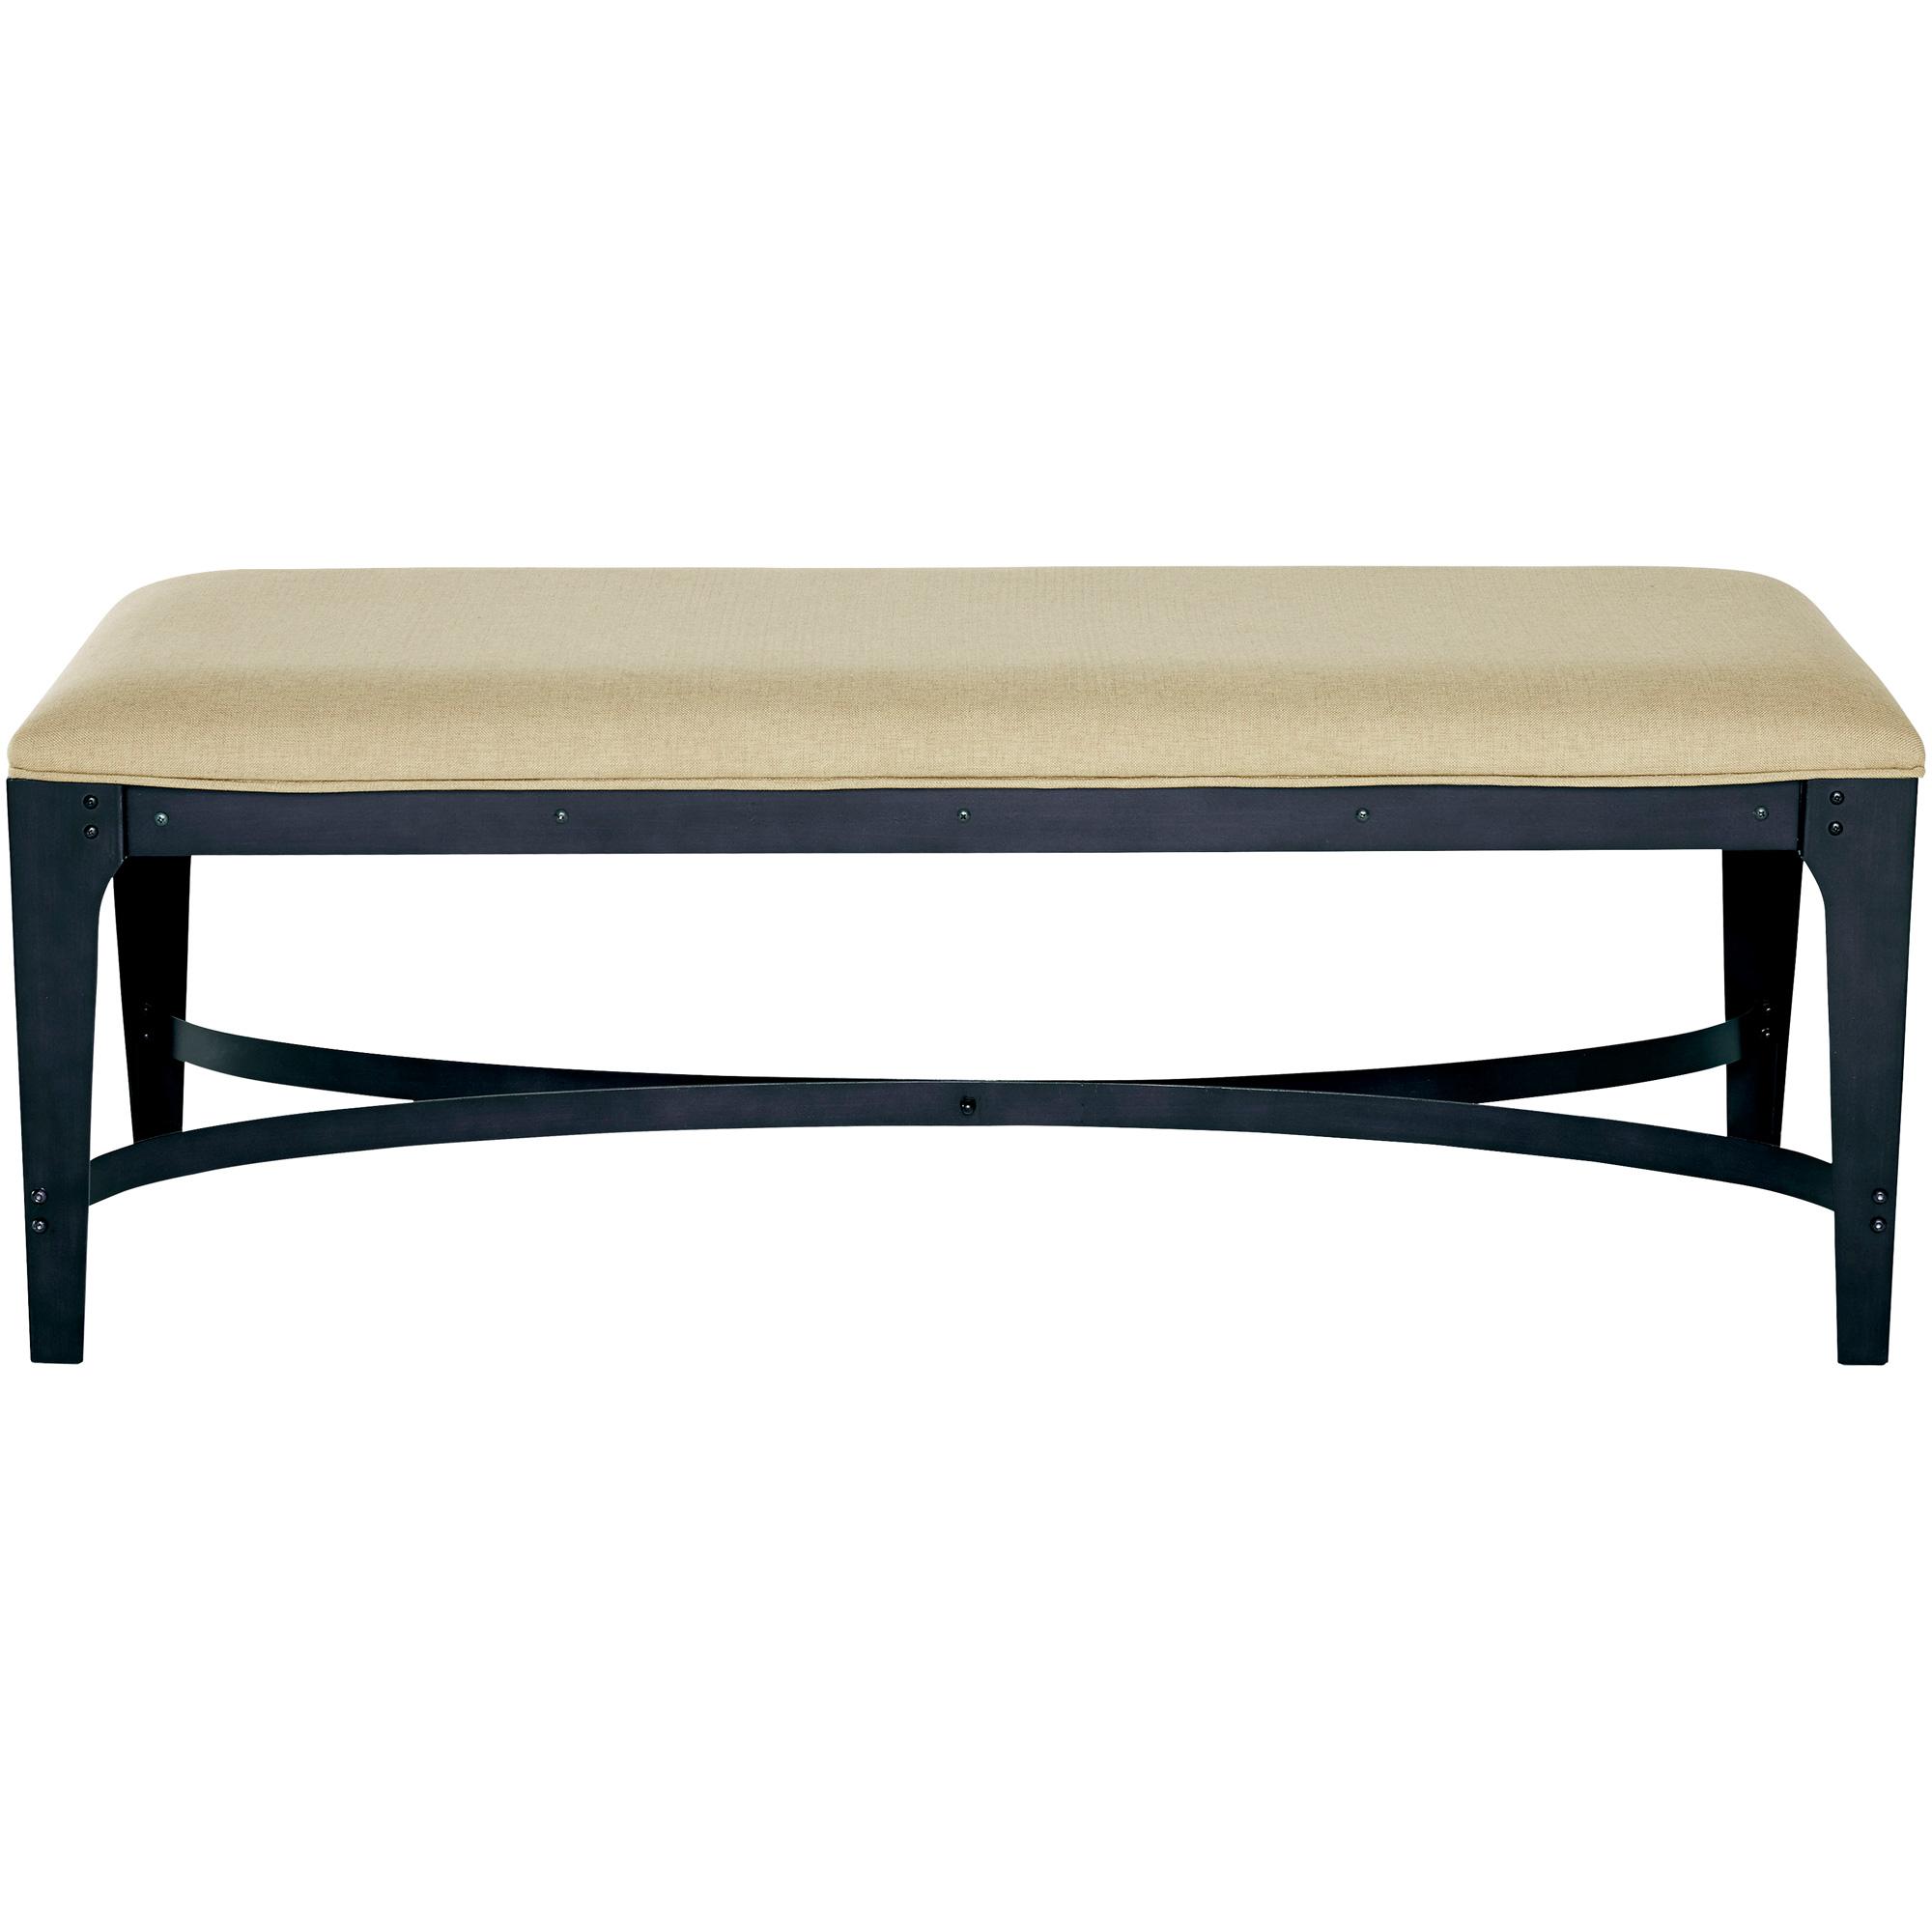 Progressive | Editor Sepia Upholstered Bench